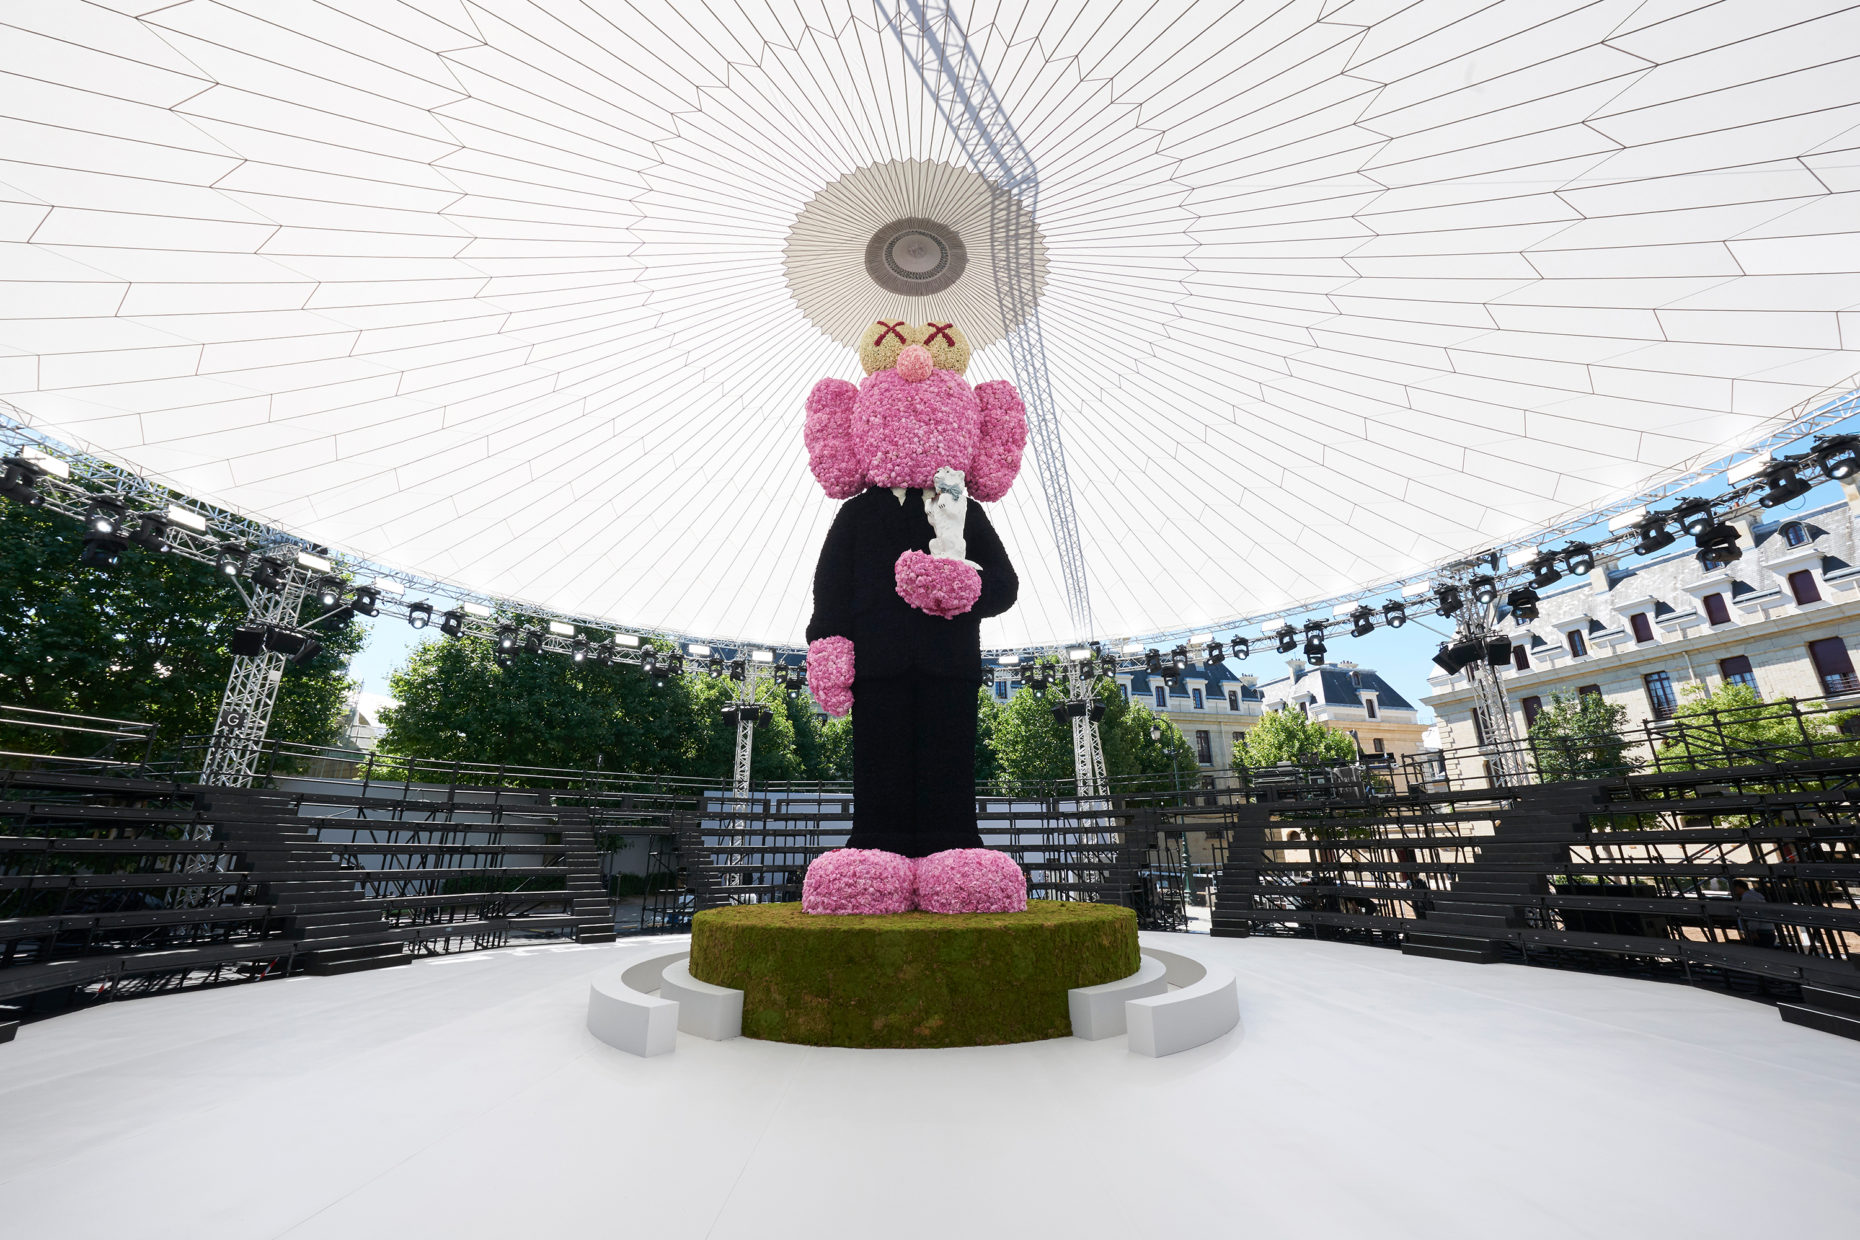 KAWS for Dior Homme Spring/Summer 2019